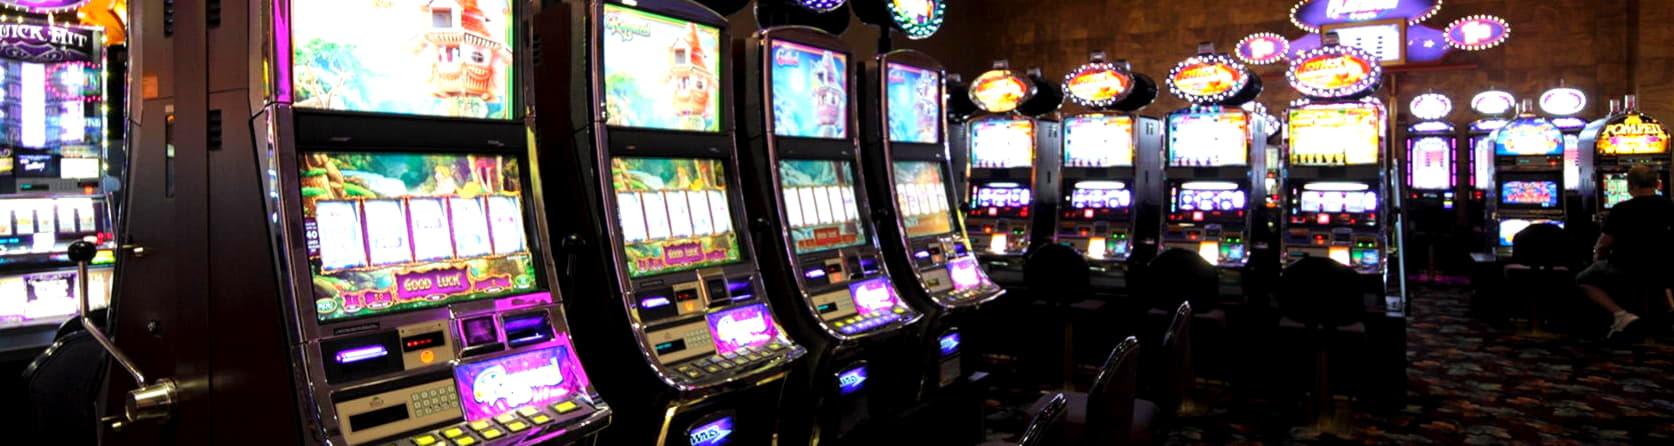 70 Free casino spins at Jackpot Capital Casino